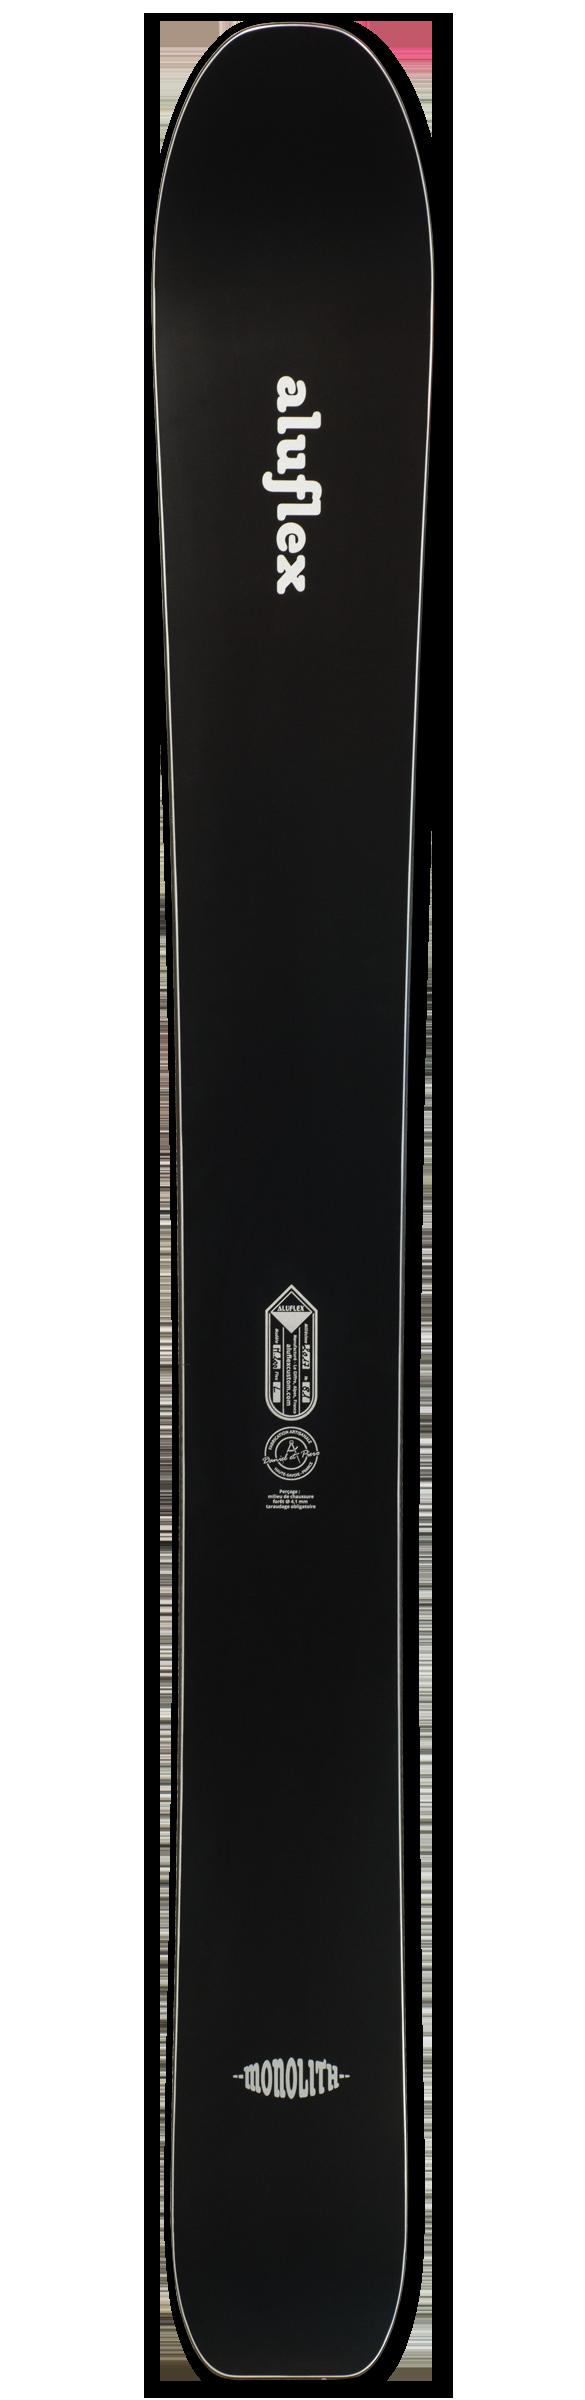 Monoski Aluflex Monolith noir